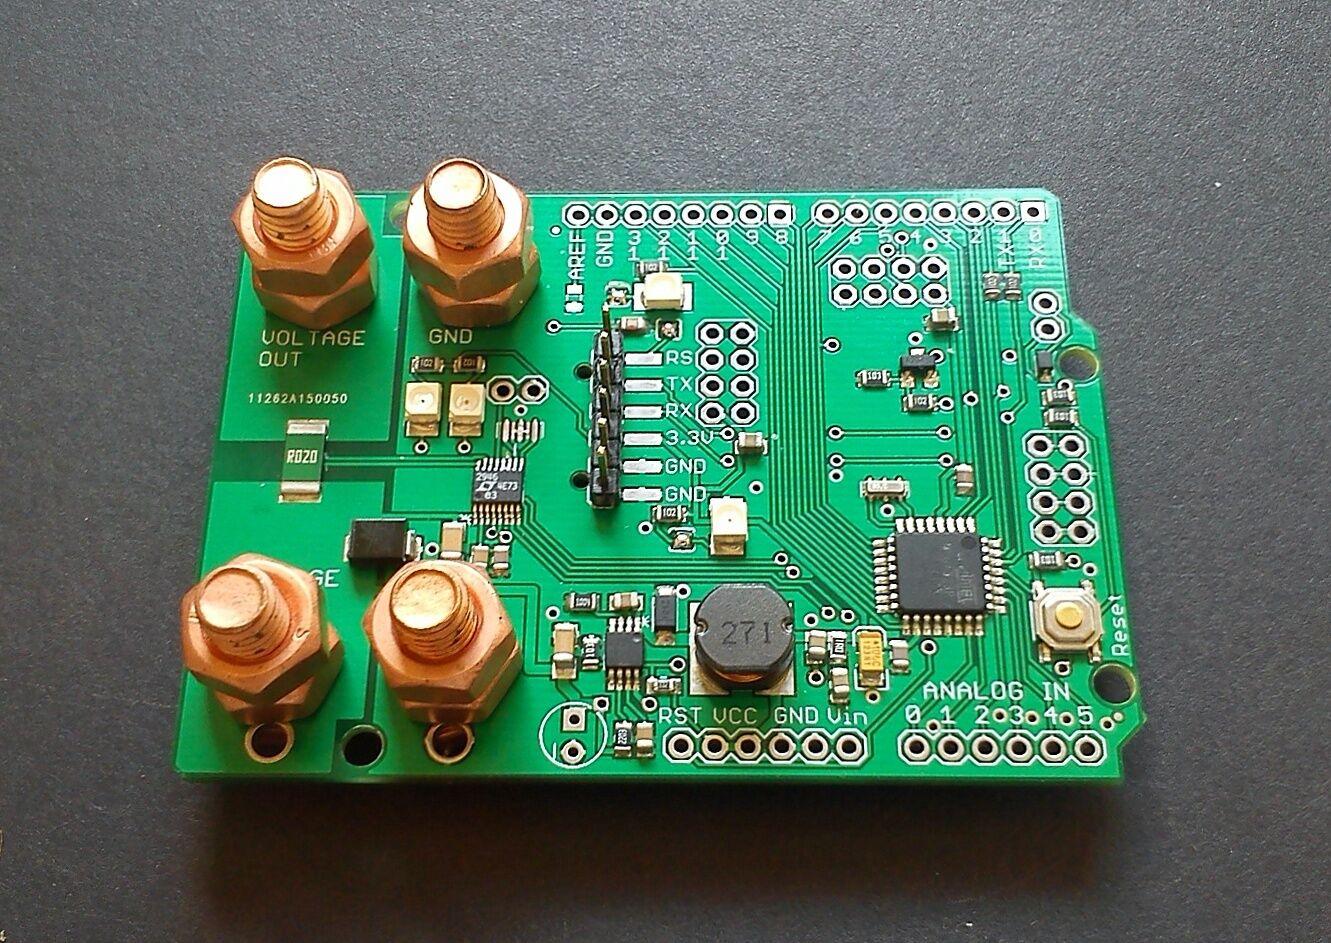 Power monitor LTC2946 and ATmega328p board w/ ESP8266 and NRF24l01+ socket